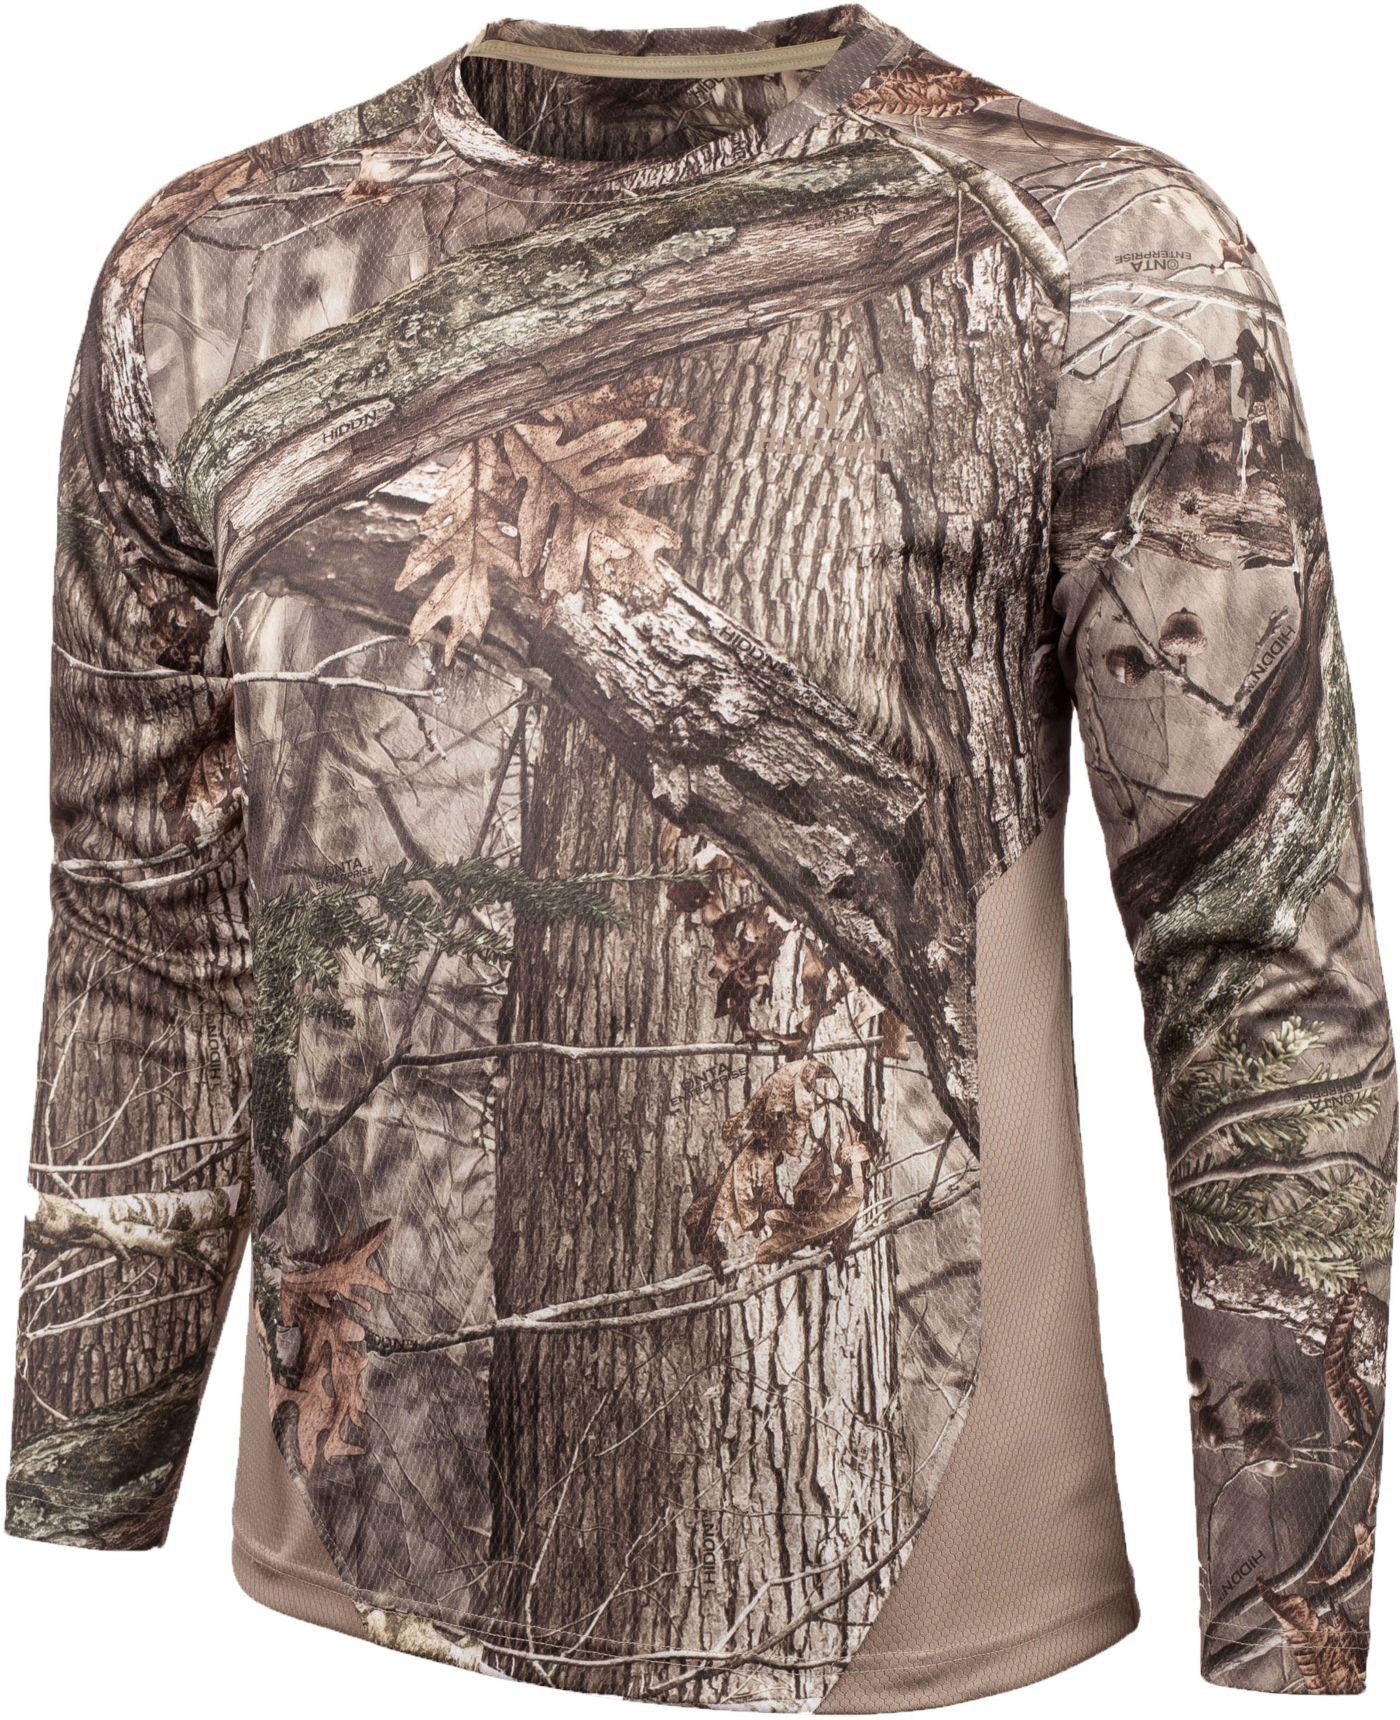 Huntworth Women's Long Sleeve Hunting Shirt